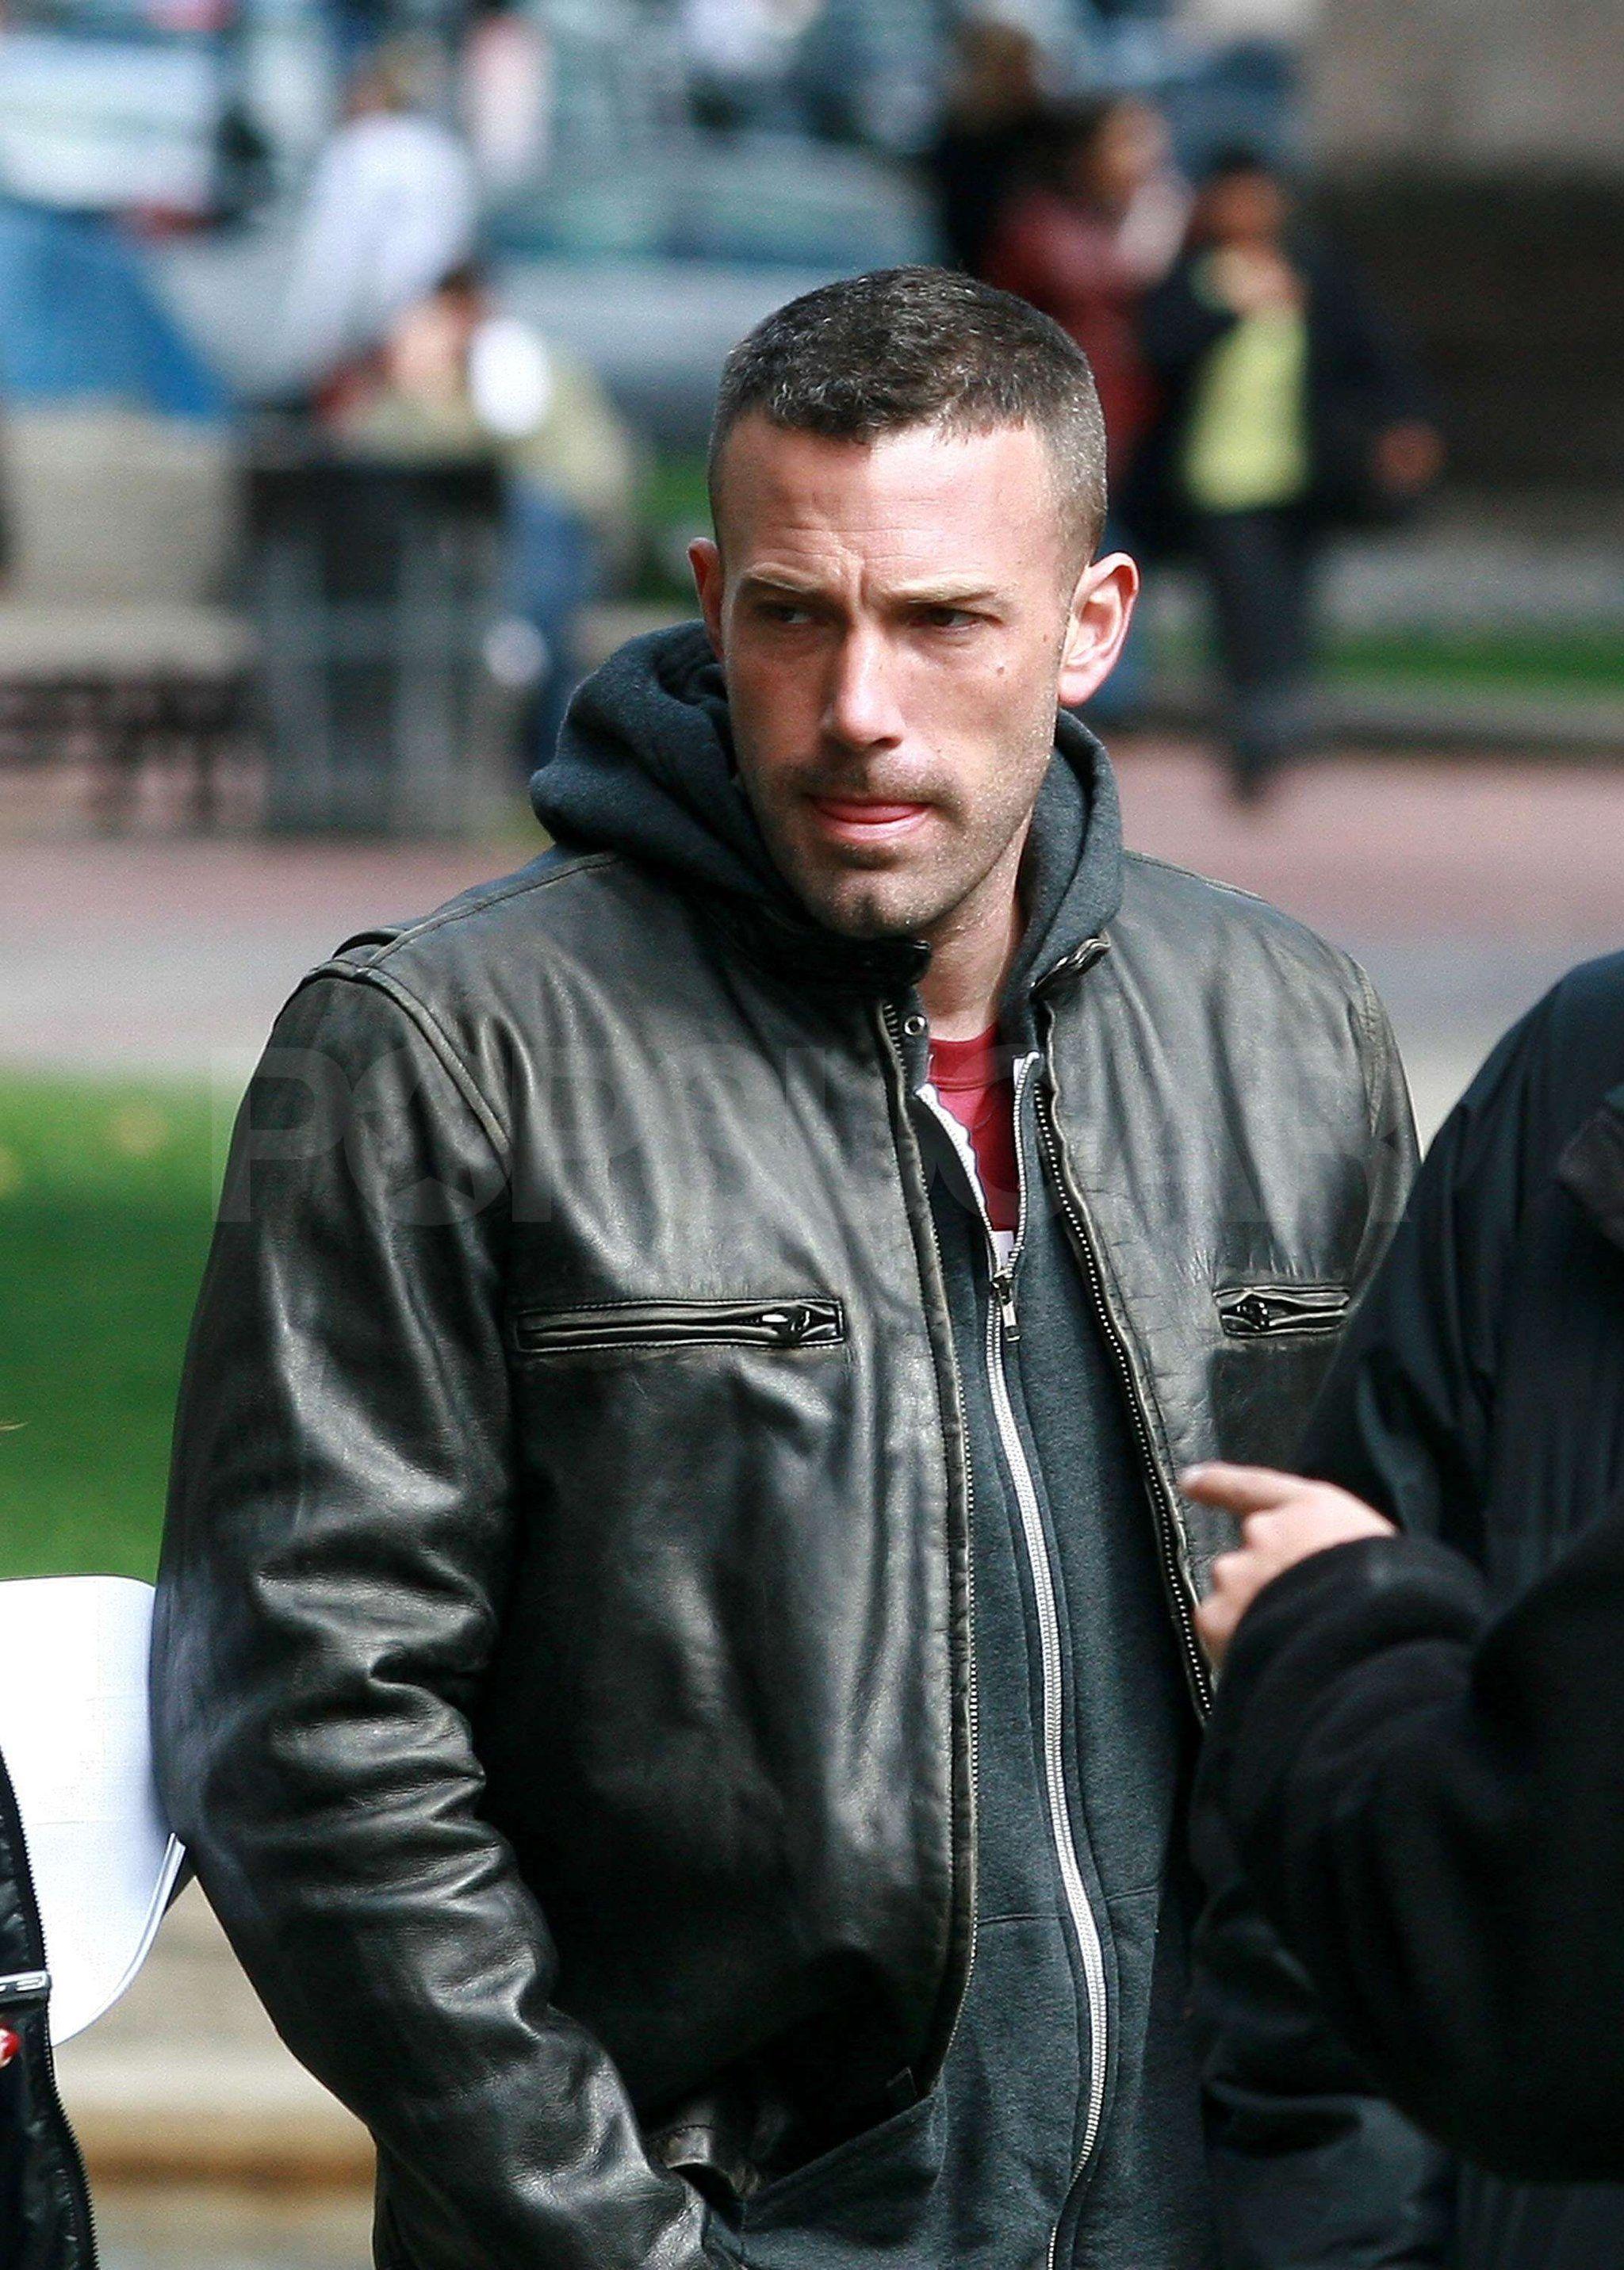 Bundles Up In Town Ben Affleck Leather Jacket | Ben ...